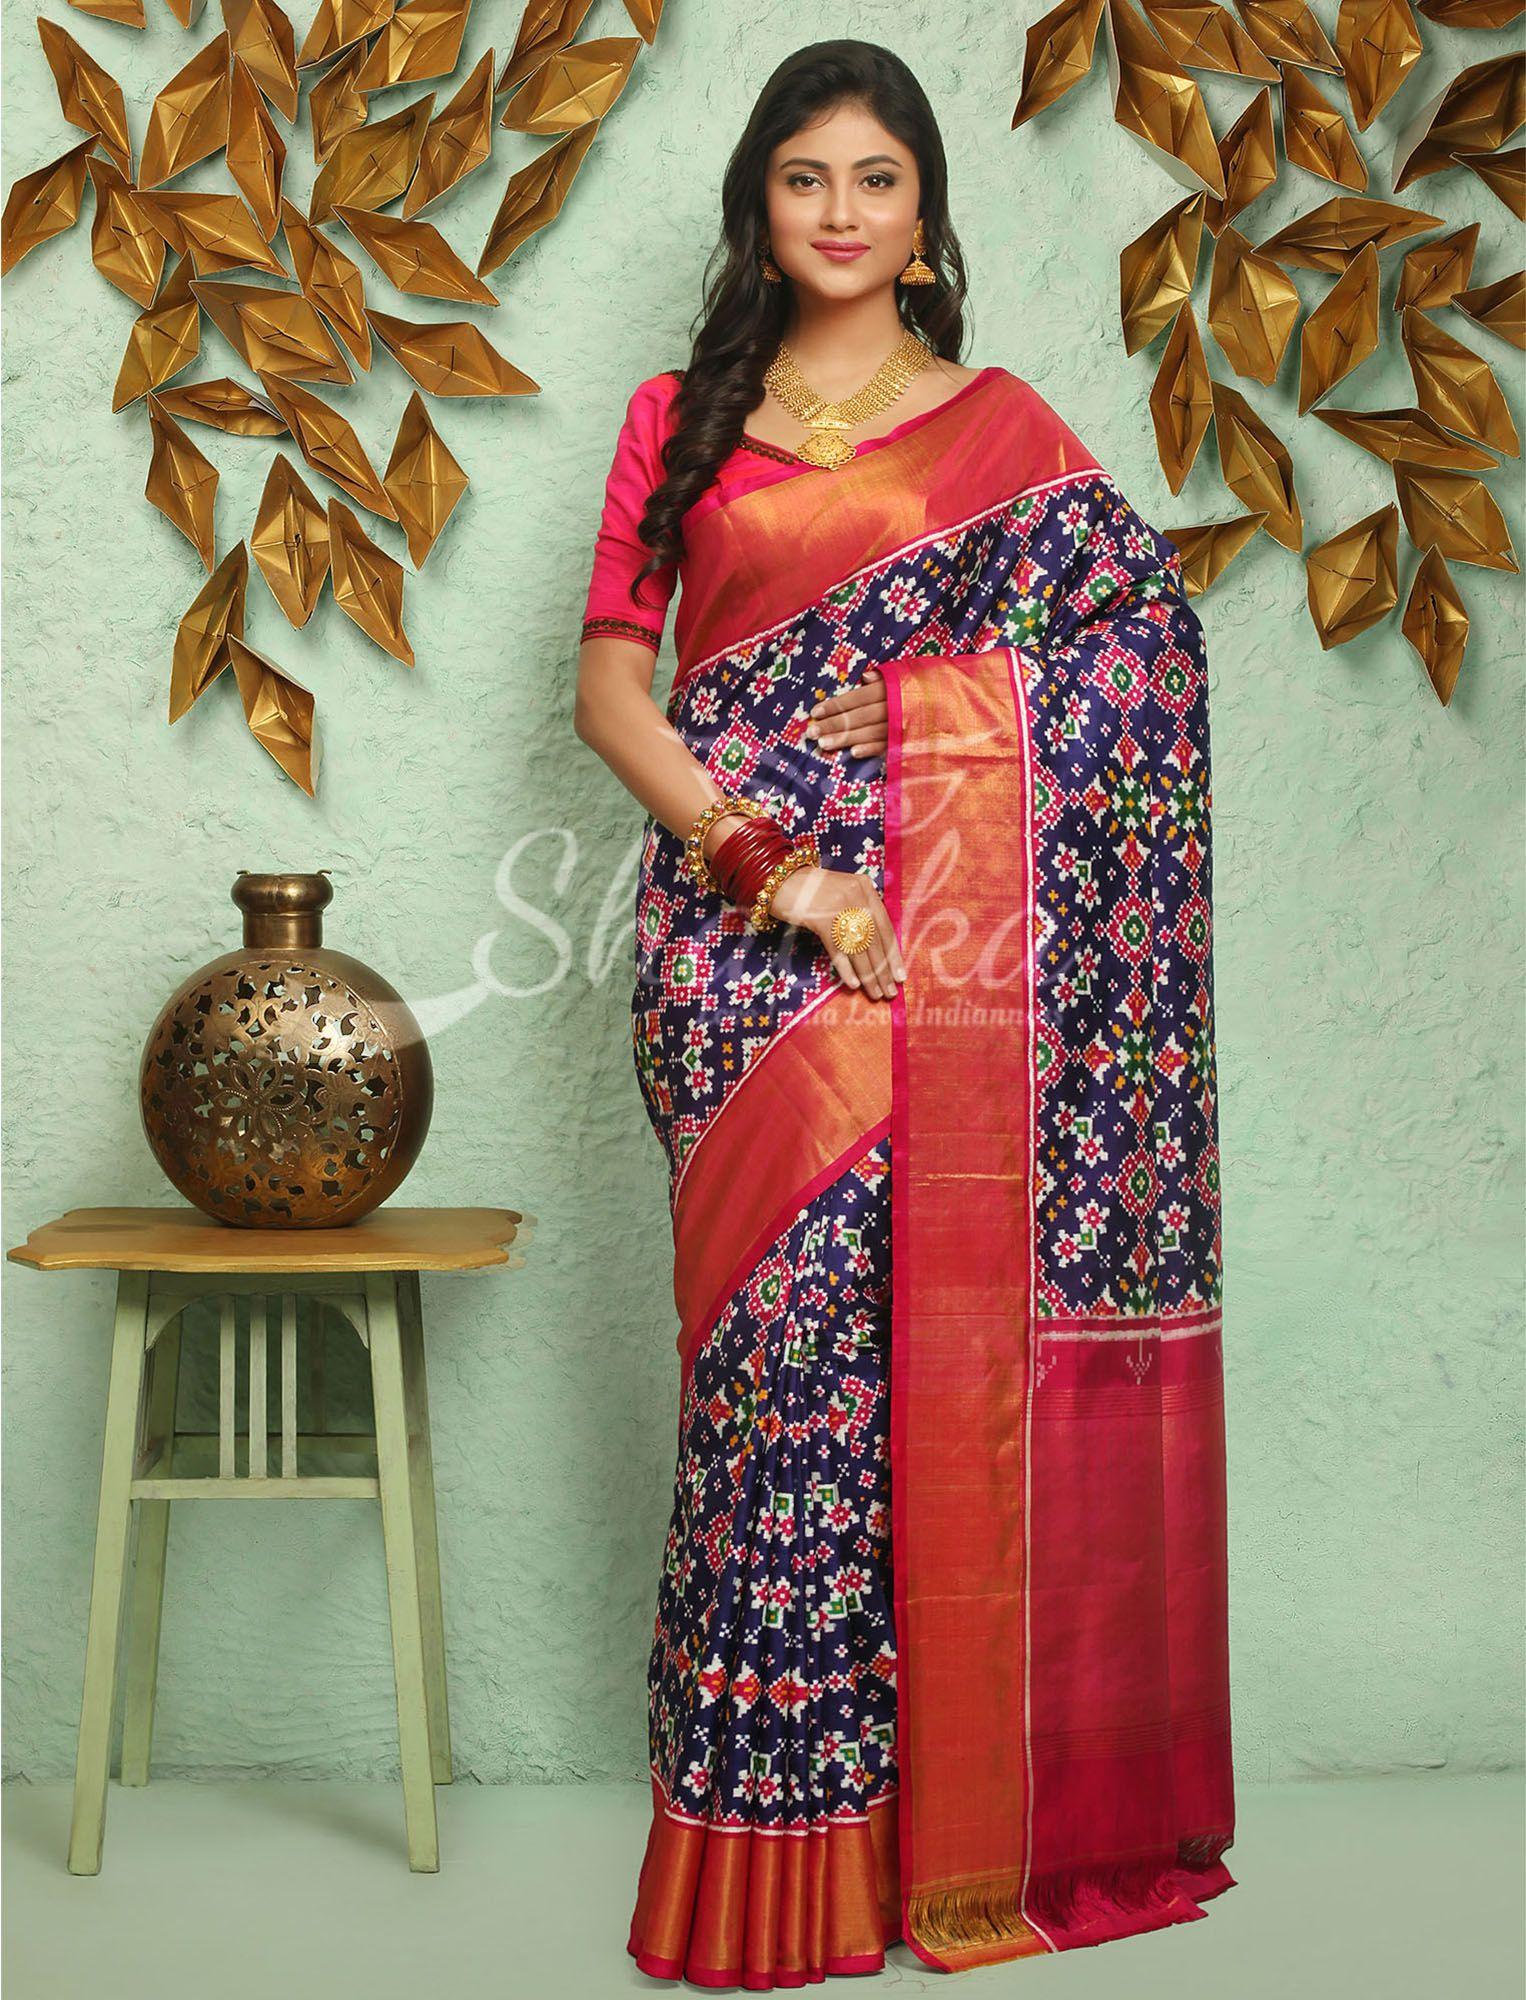 6f21a09c72e7a Hansaben Royal Deep Blue With Dazzling Colorful Design Double Ikat Patan  Patola Saree